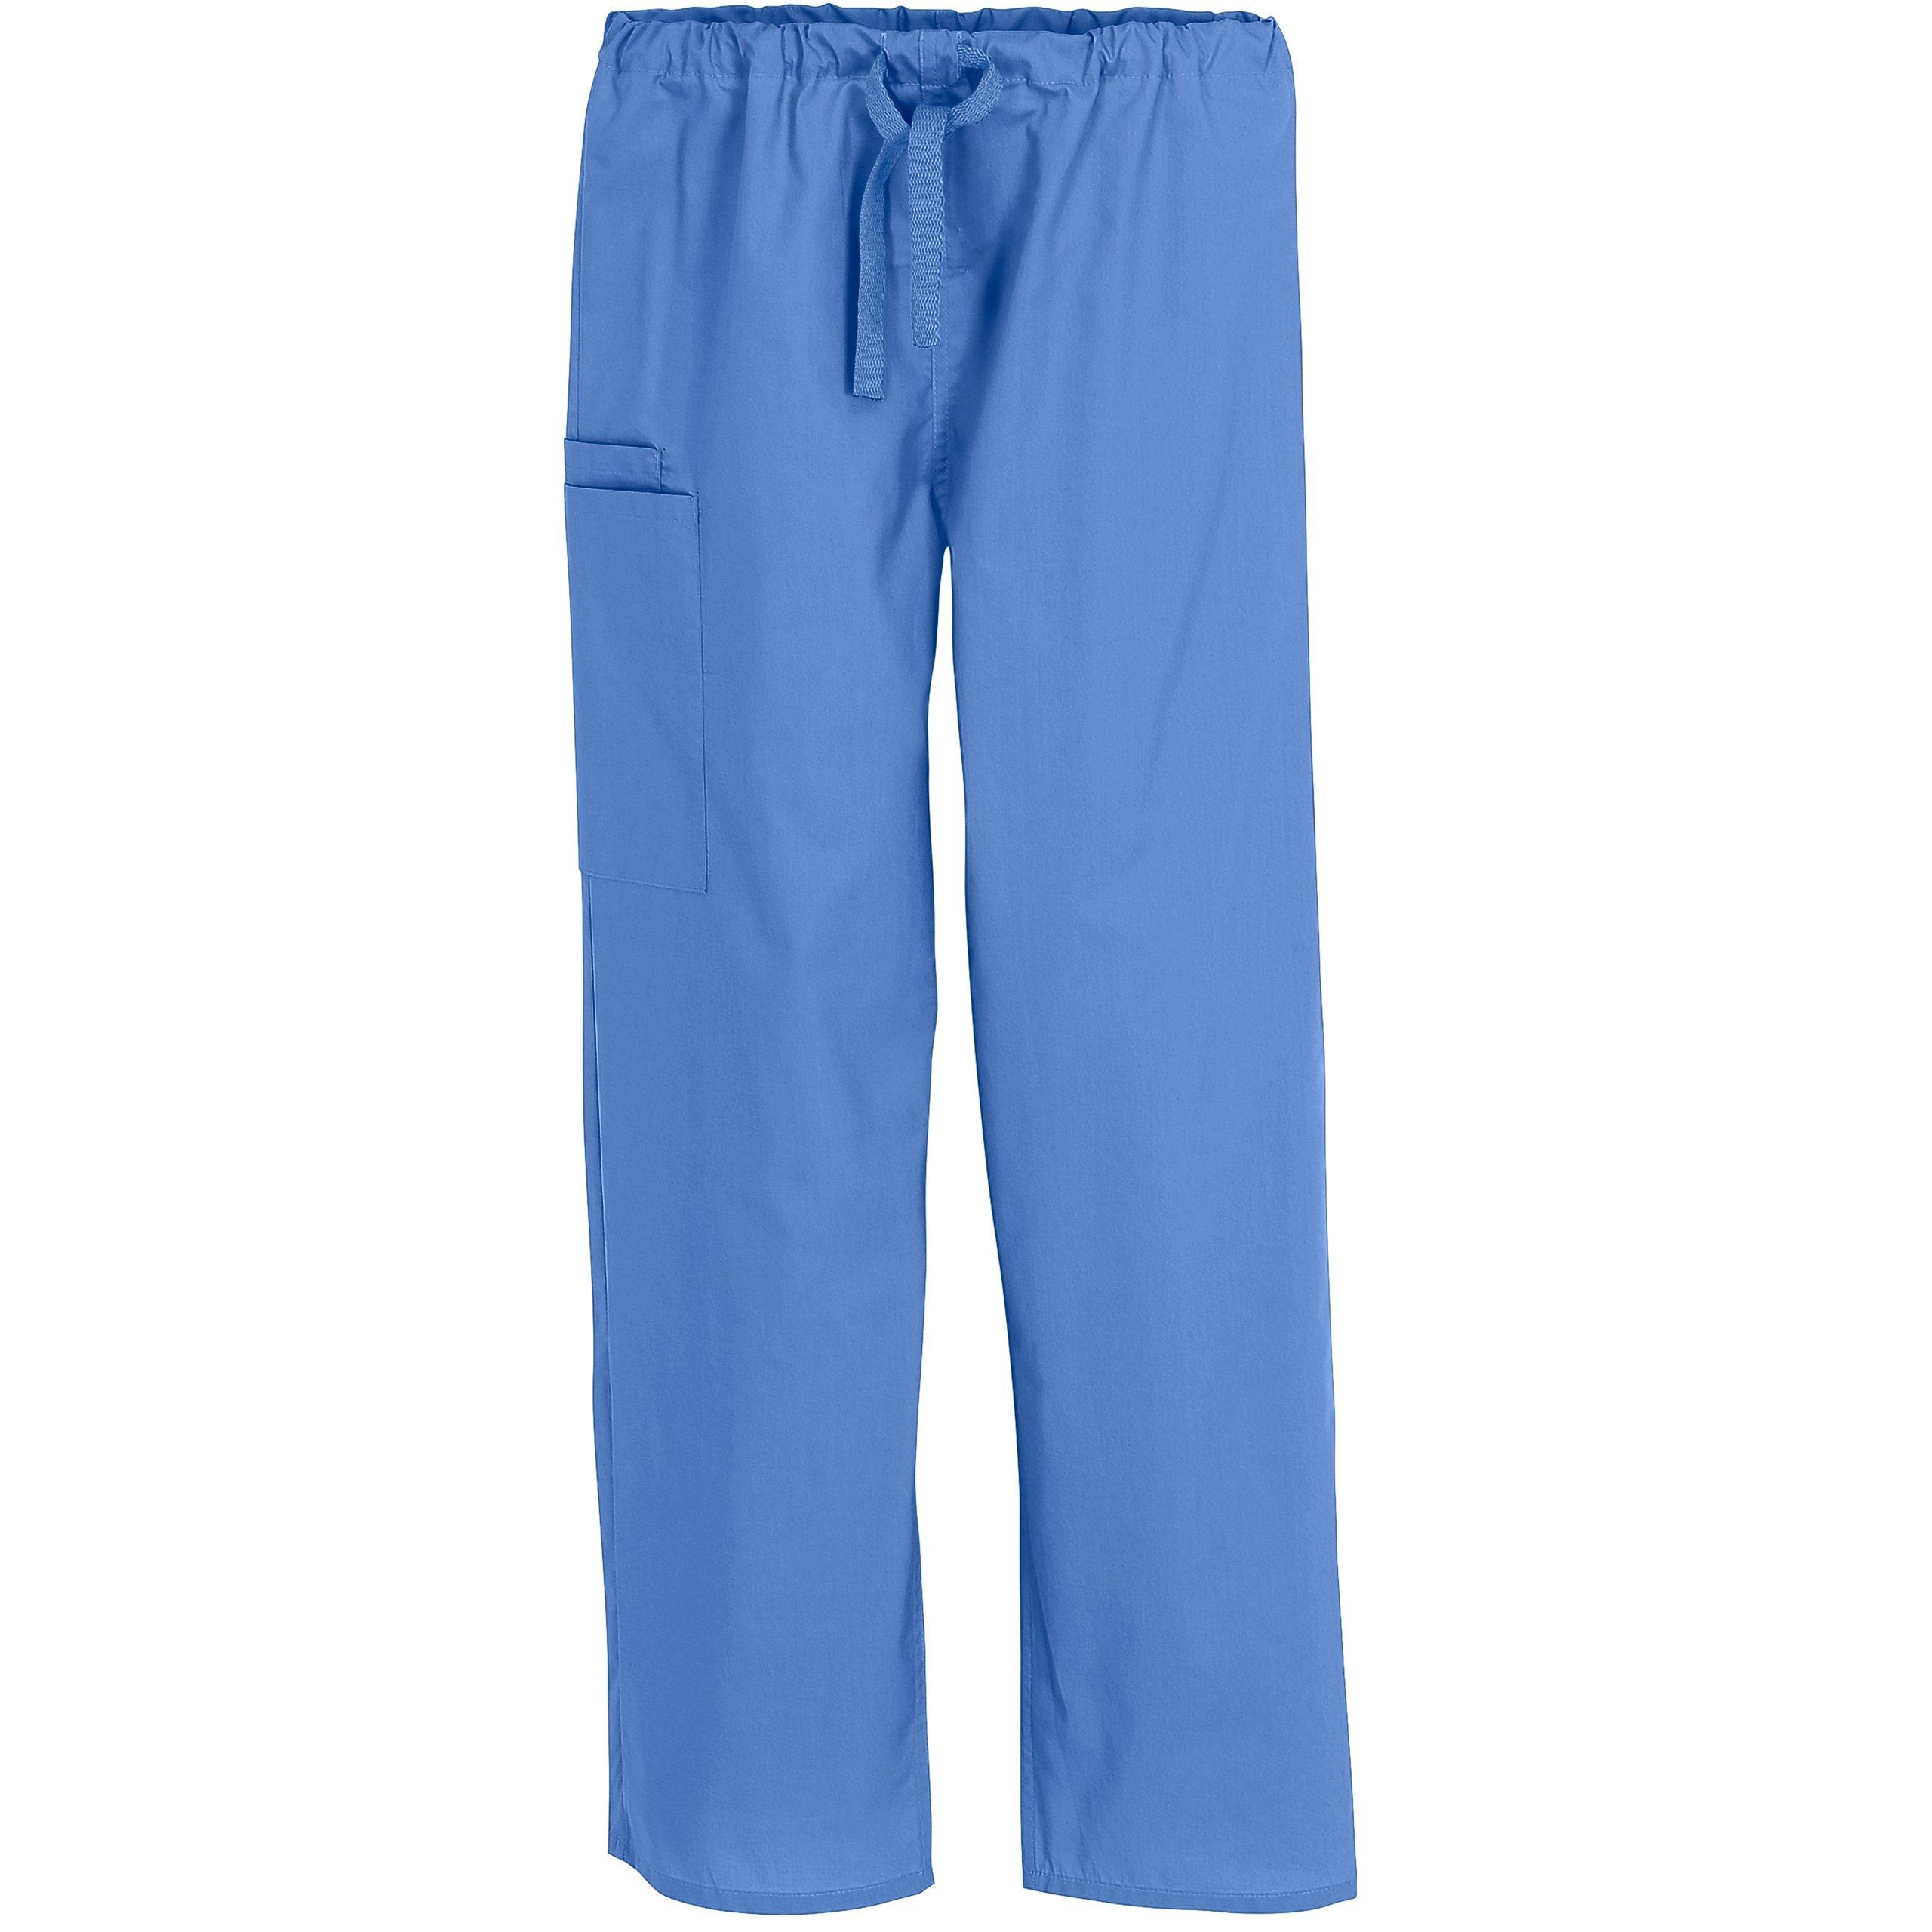 Strictly Scrubs Unisex Medical Uniform Set (Medium, Ceil) by Strictly Scrubs (Image #3)